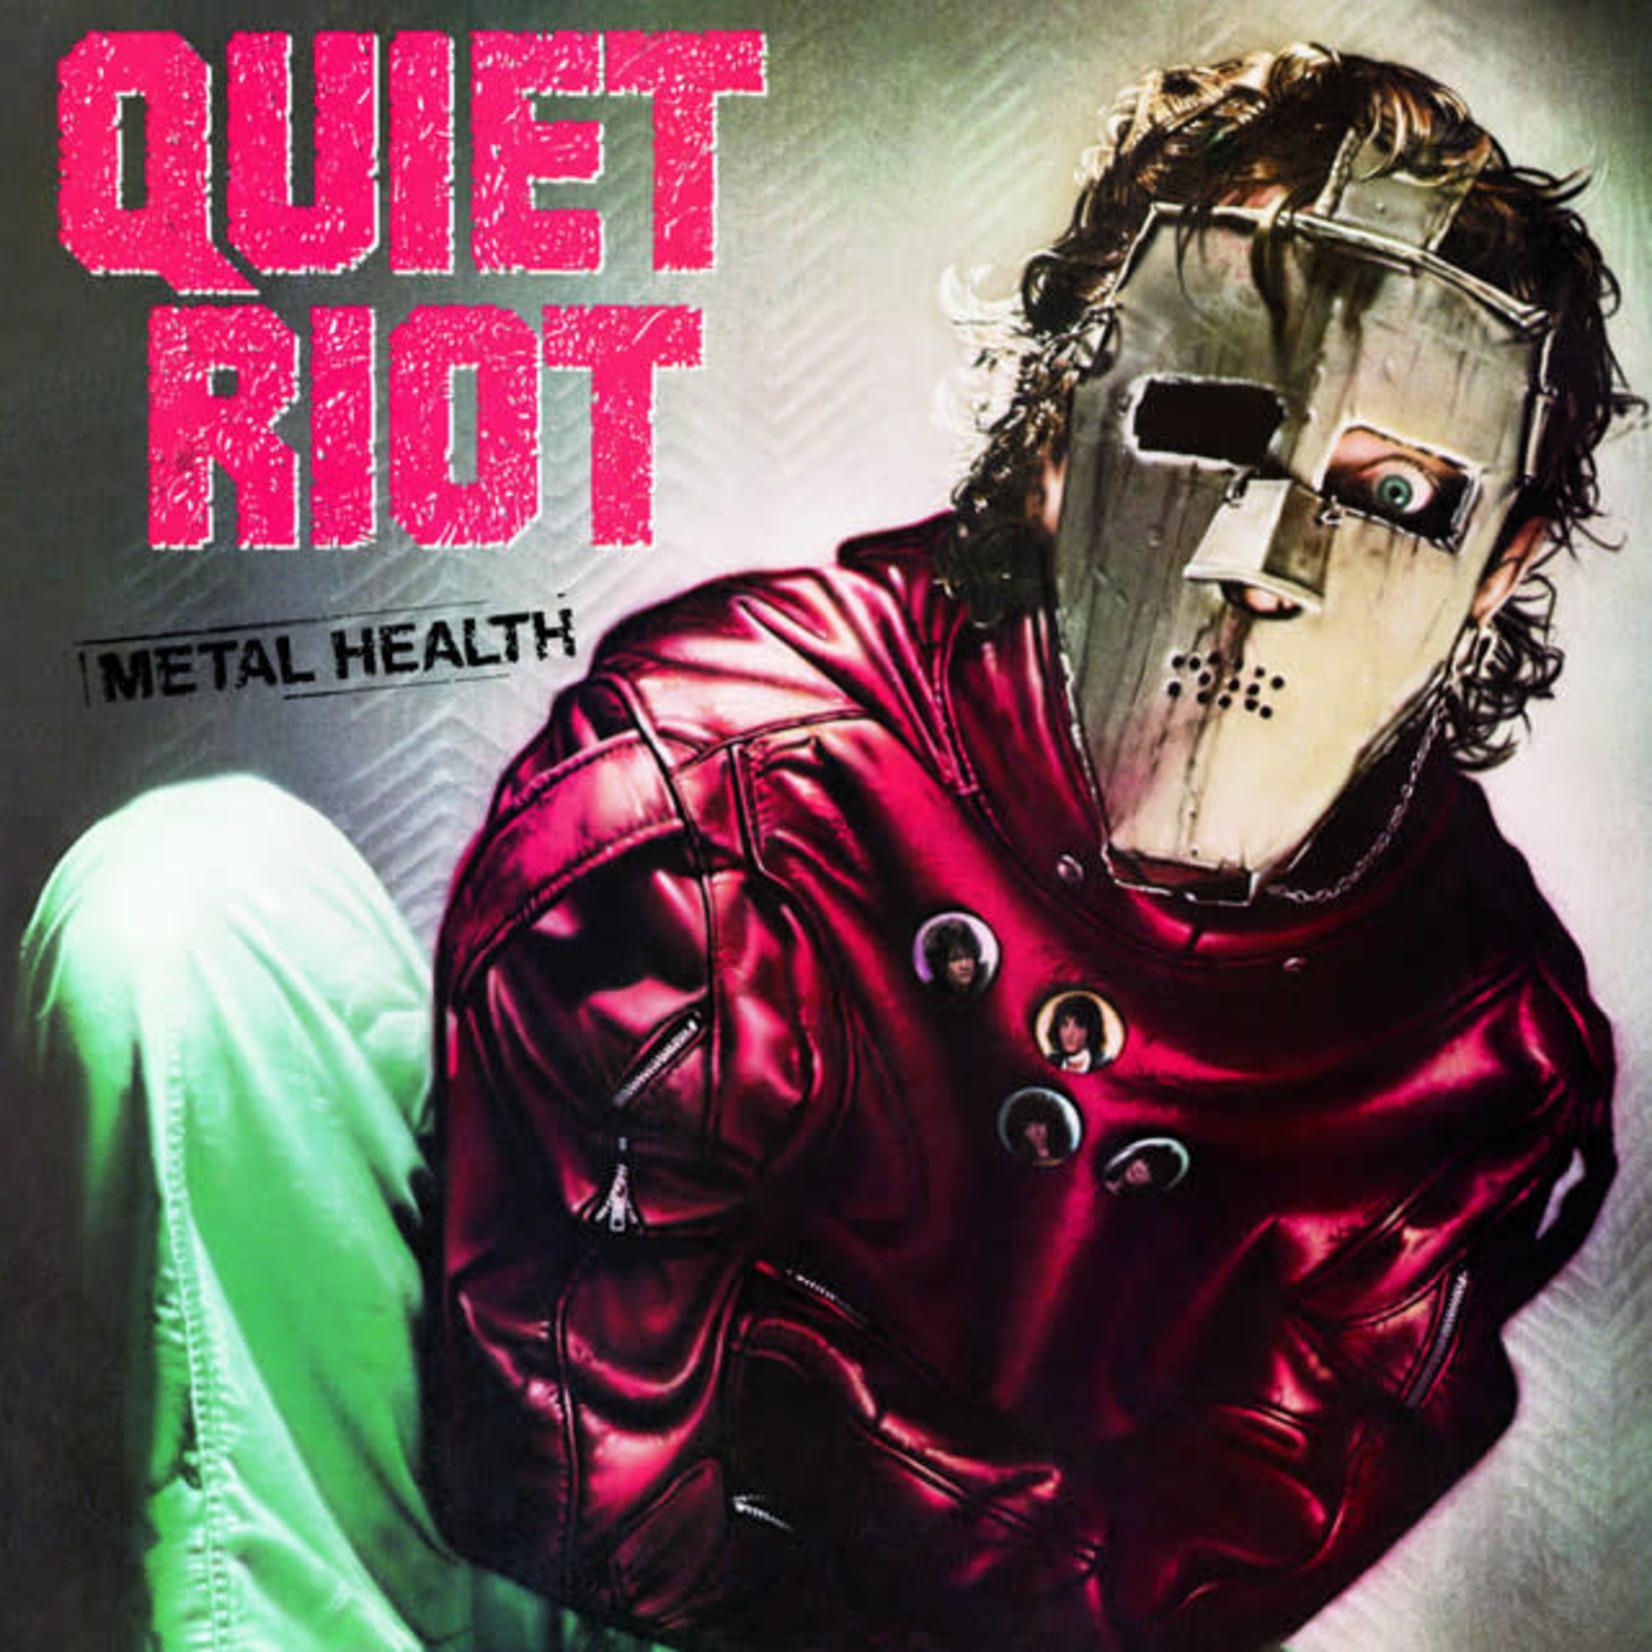 Vinyl Quiet Riot - Metal Health (1983 Sealed)